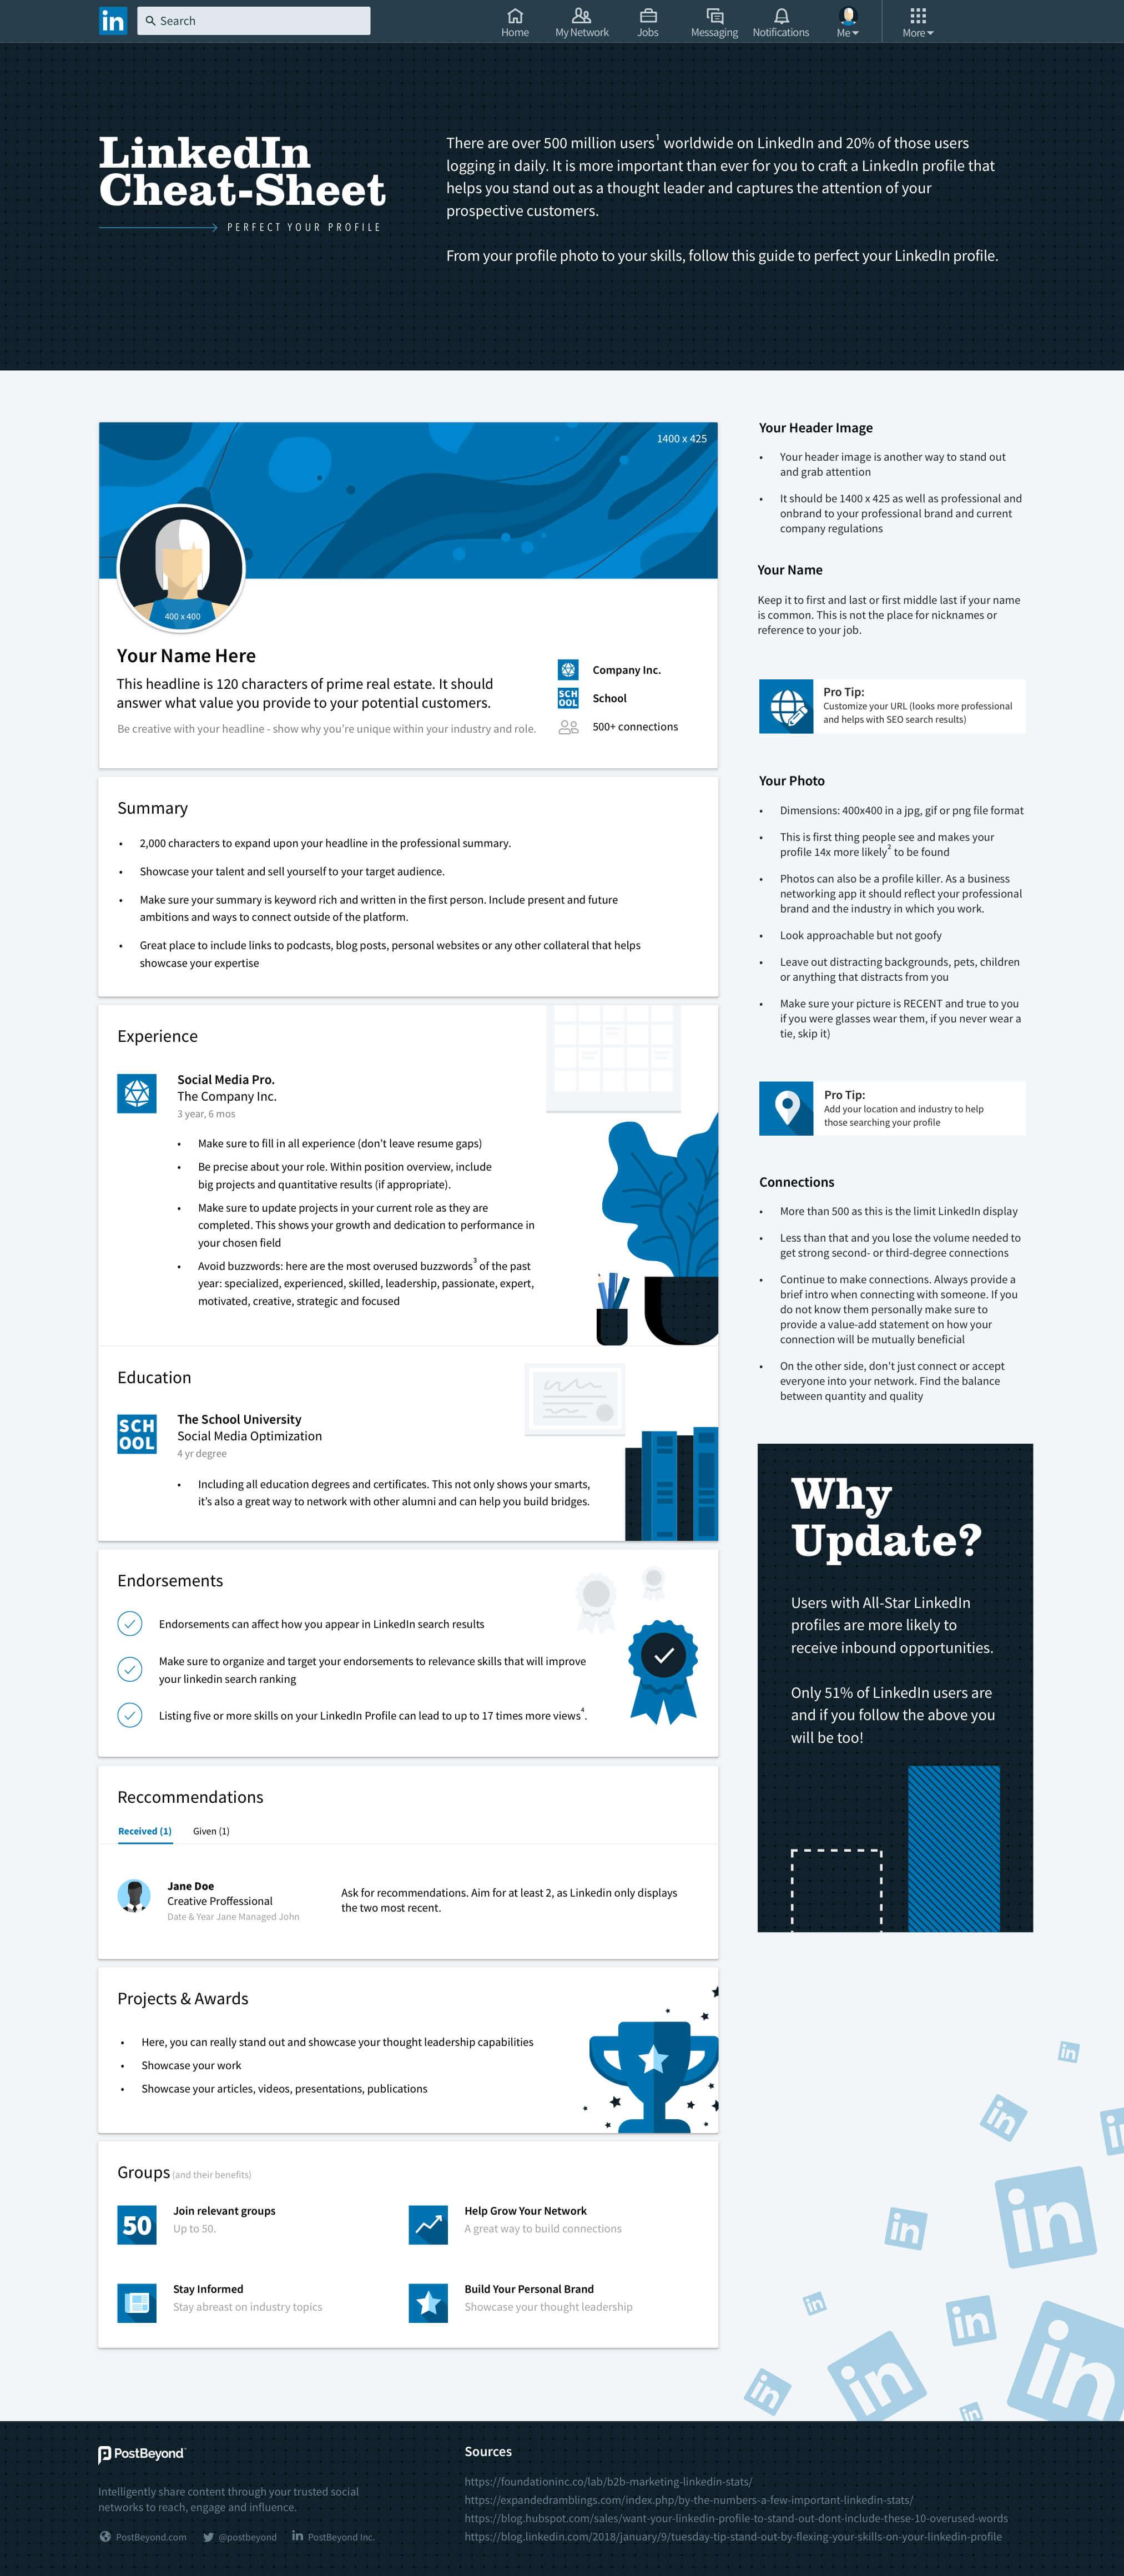 Infographic: Ideal LinkedIn Profile